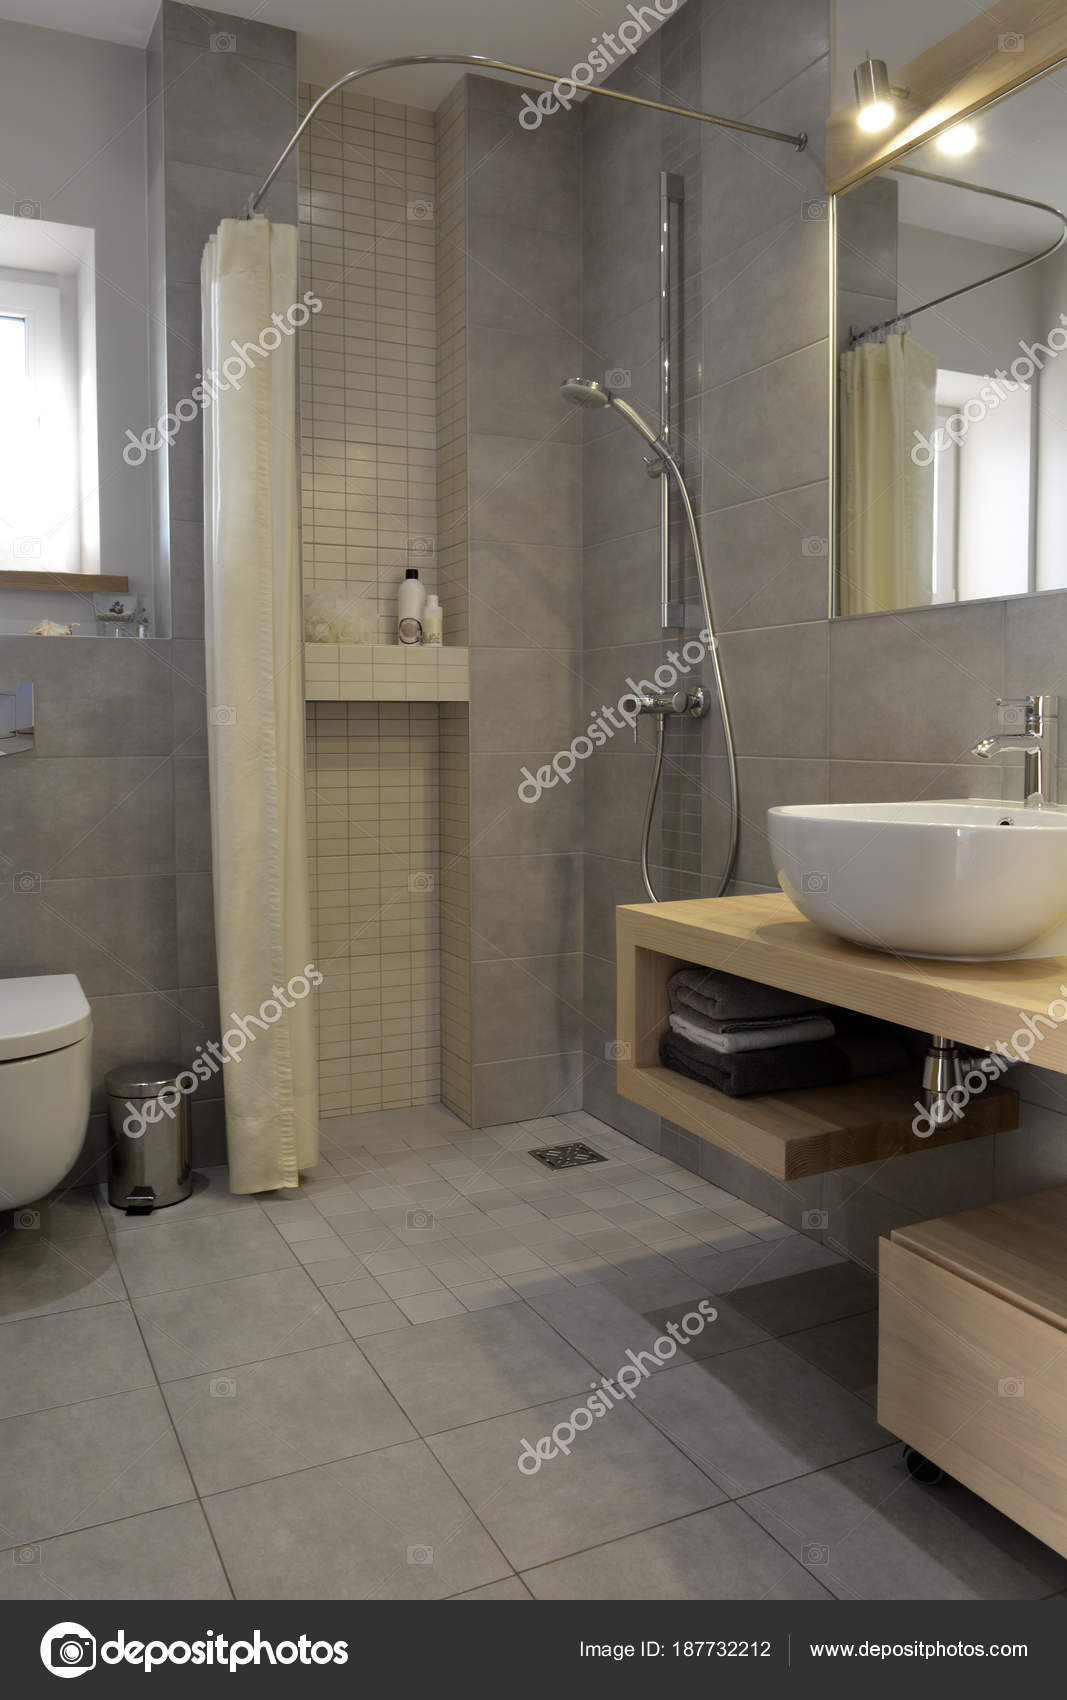 Modernes badezimmer design — Stockfoto © CharMoment #187732212